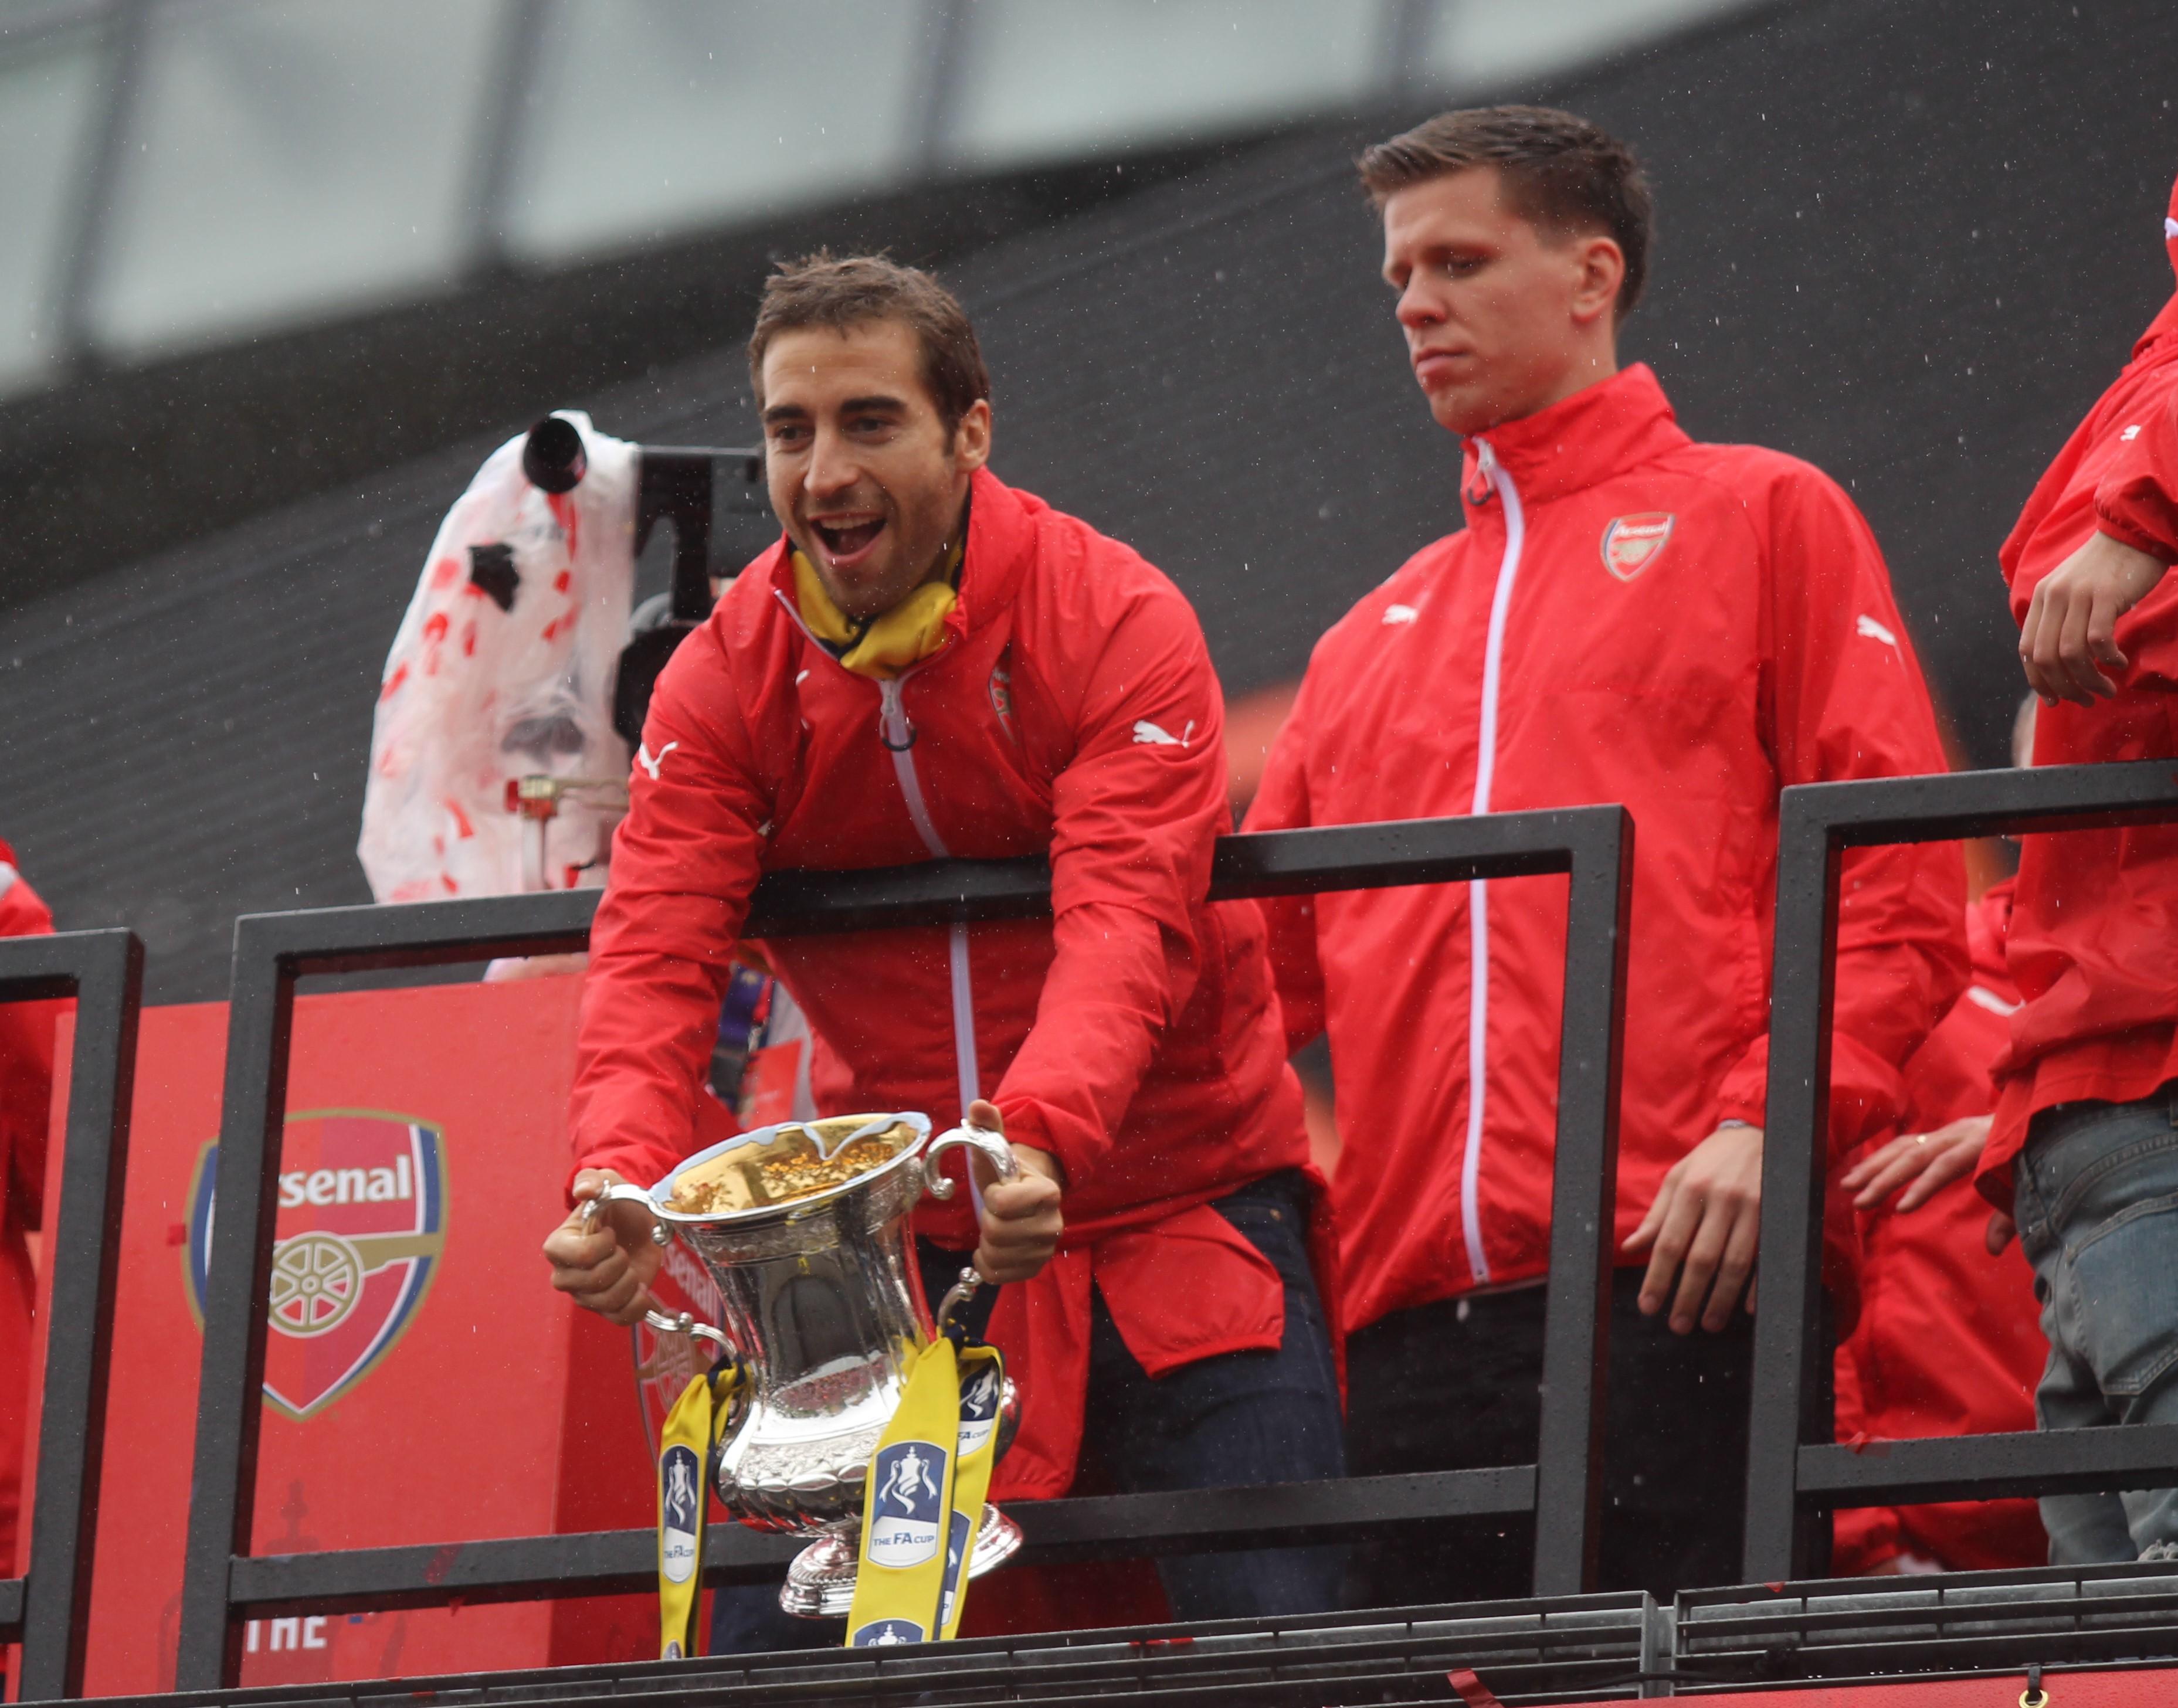 Arsenal FA Cup Parade 2015